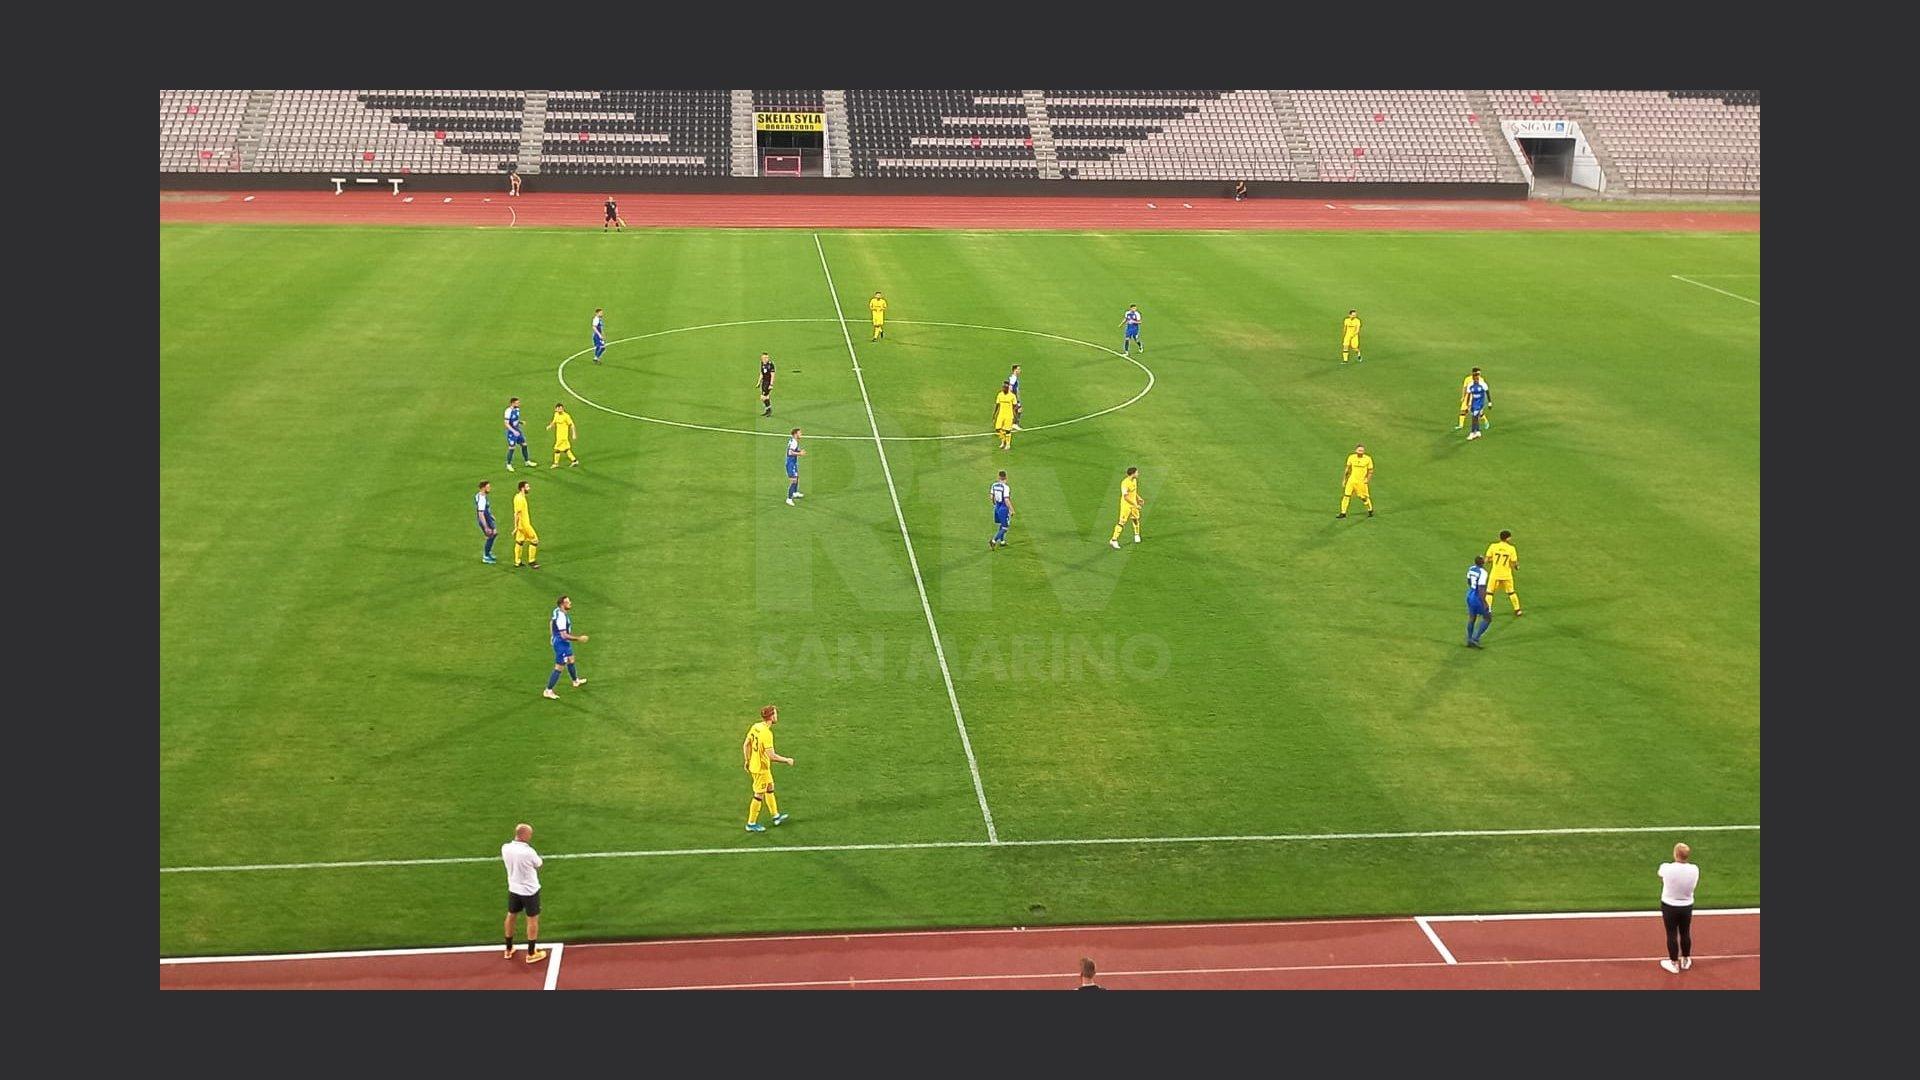 Фольгоре (Сан-Марино) - Приштина (Косово) 0:2